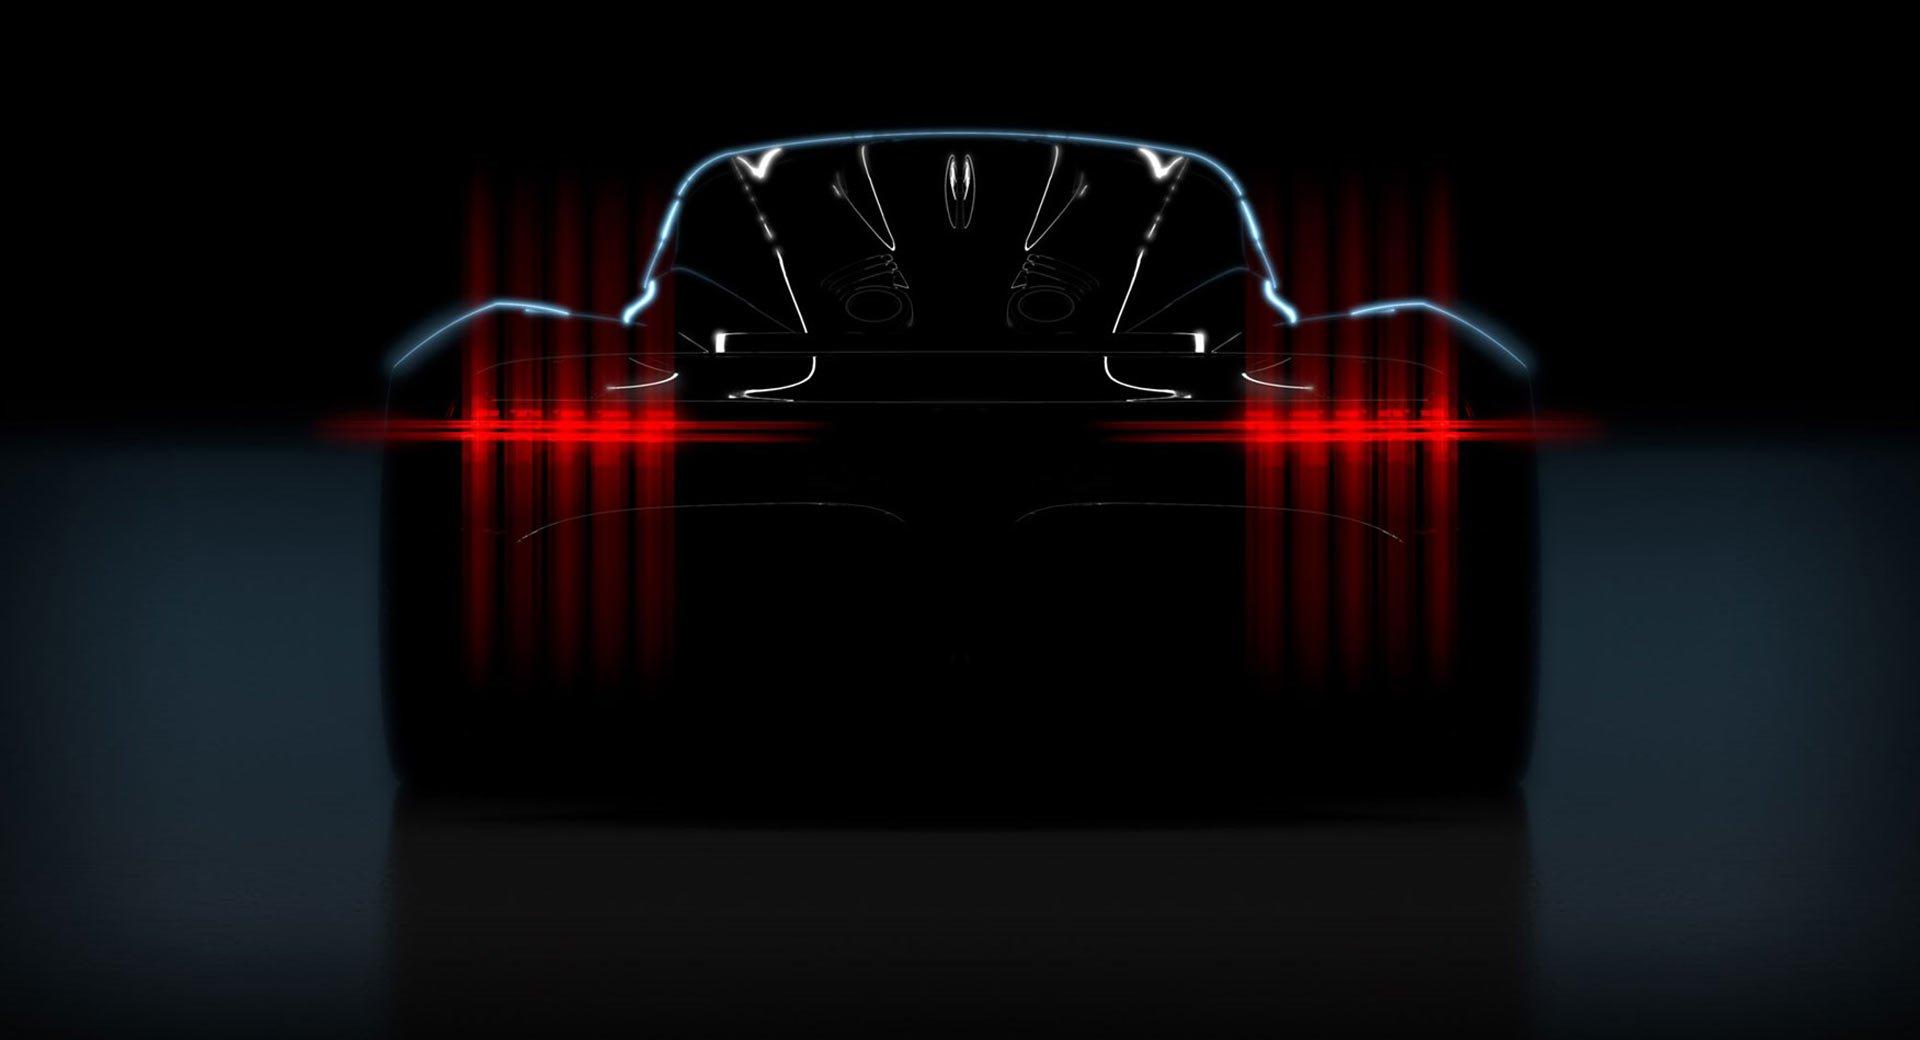 Aston Martin 003 Hiper automobil